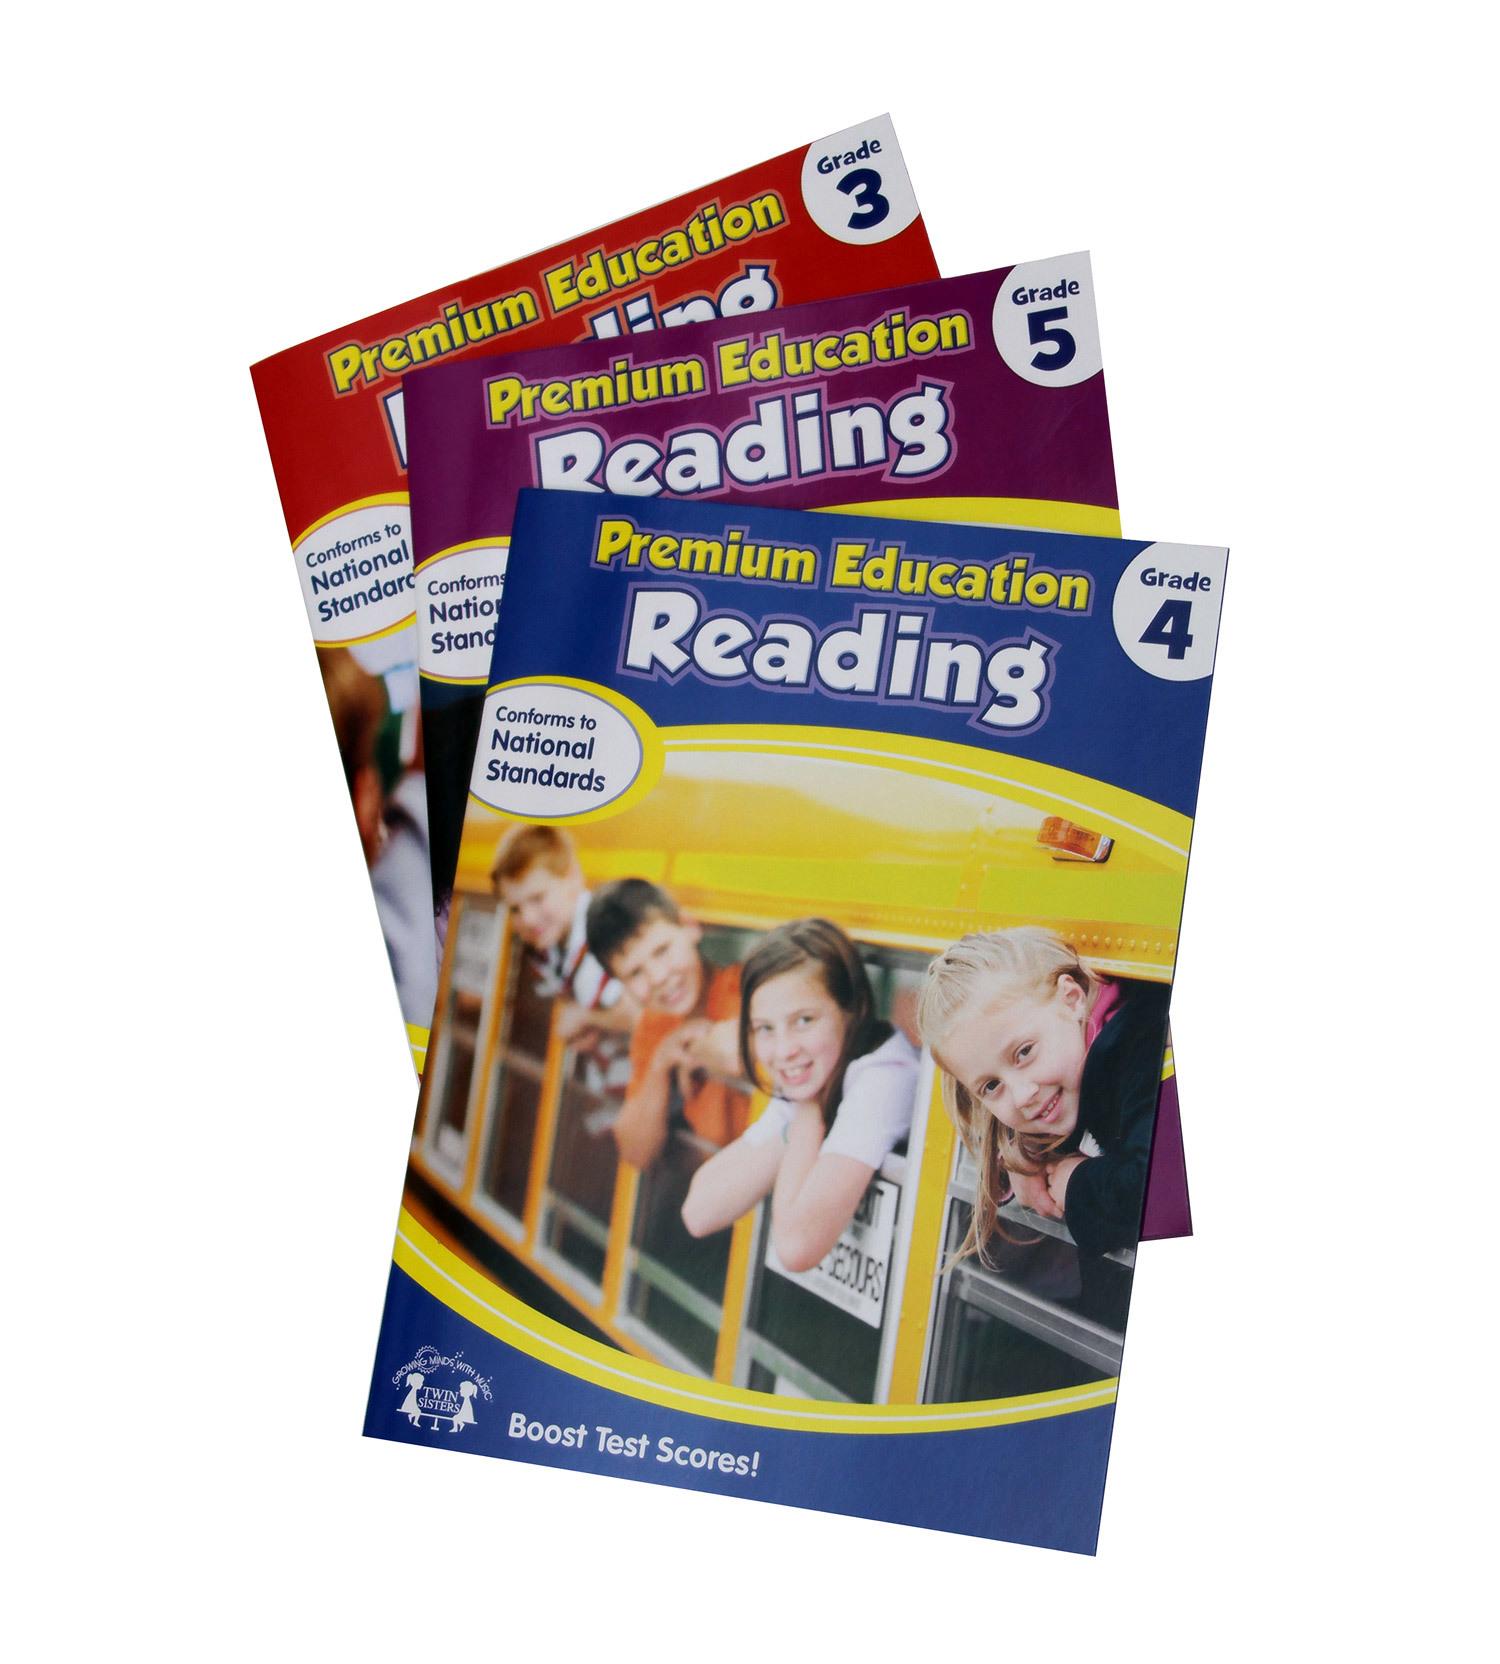 Reading-workbooks2.jpg